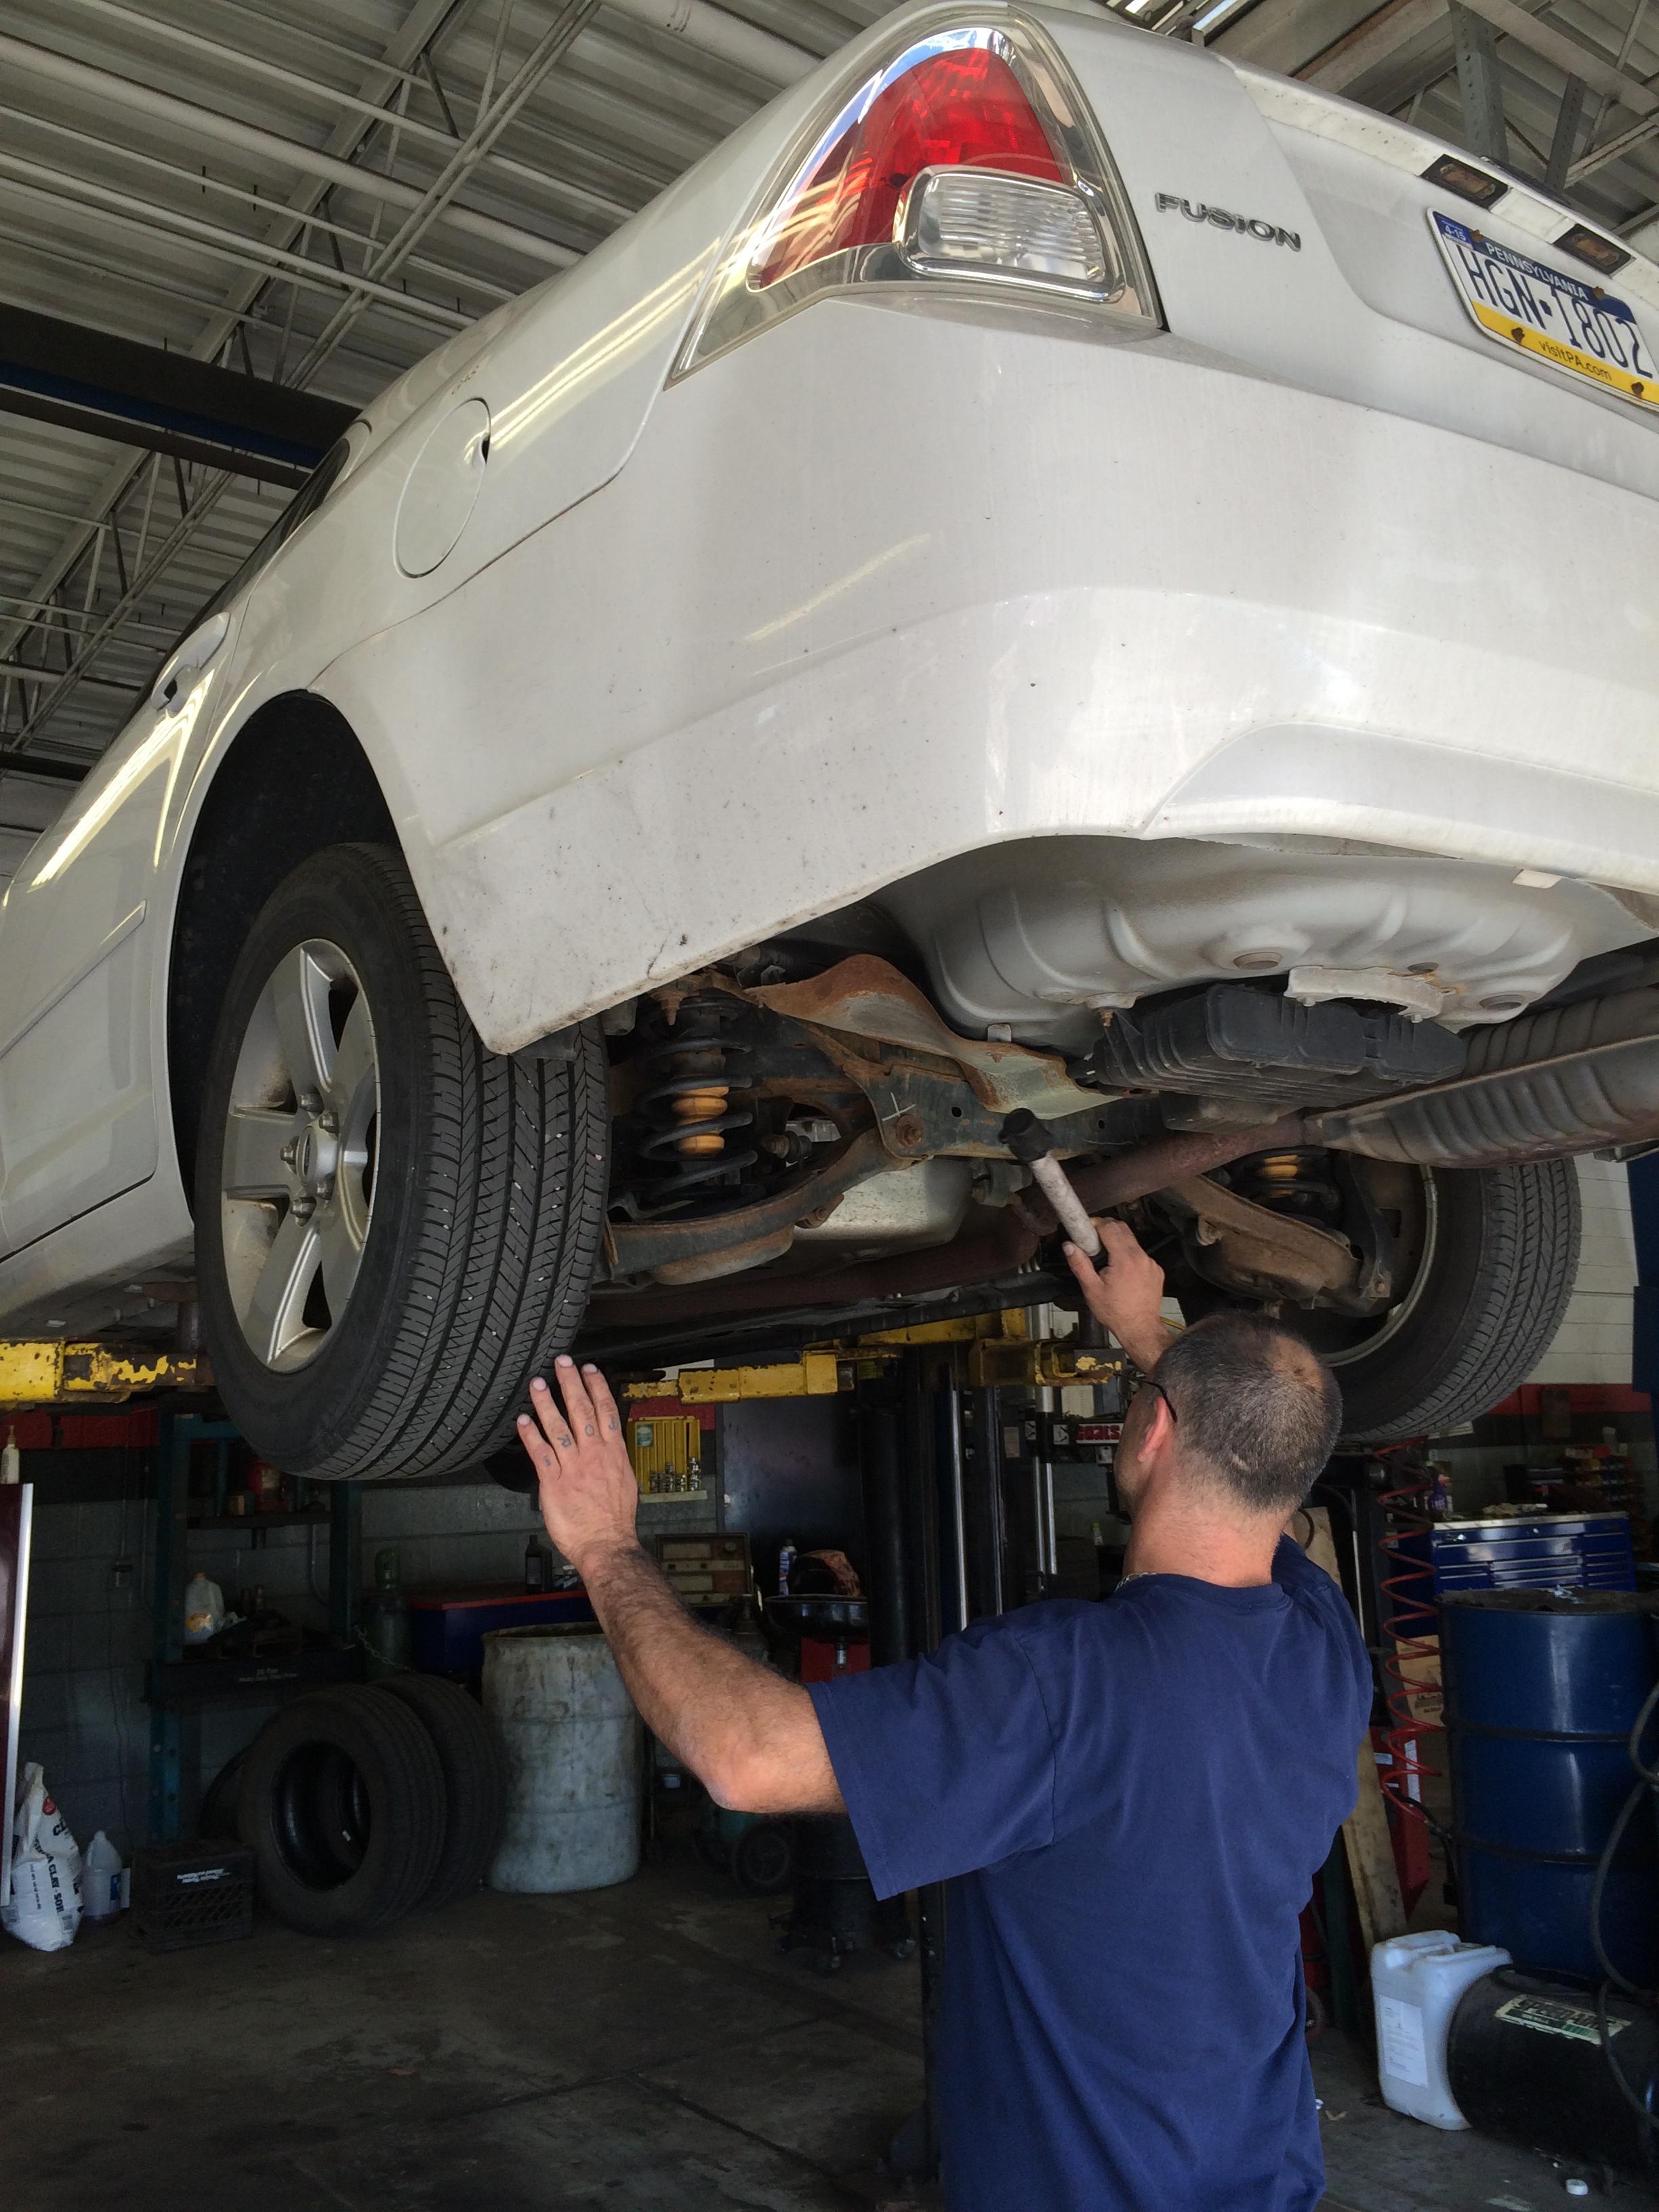 Mccarthy tire service in harrisburg pa auto repair for Firestone motors harrisburg pa